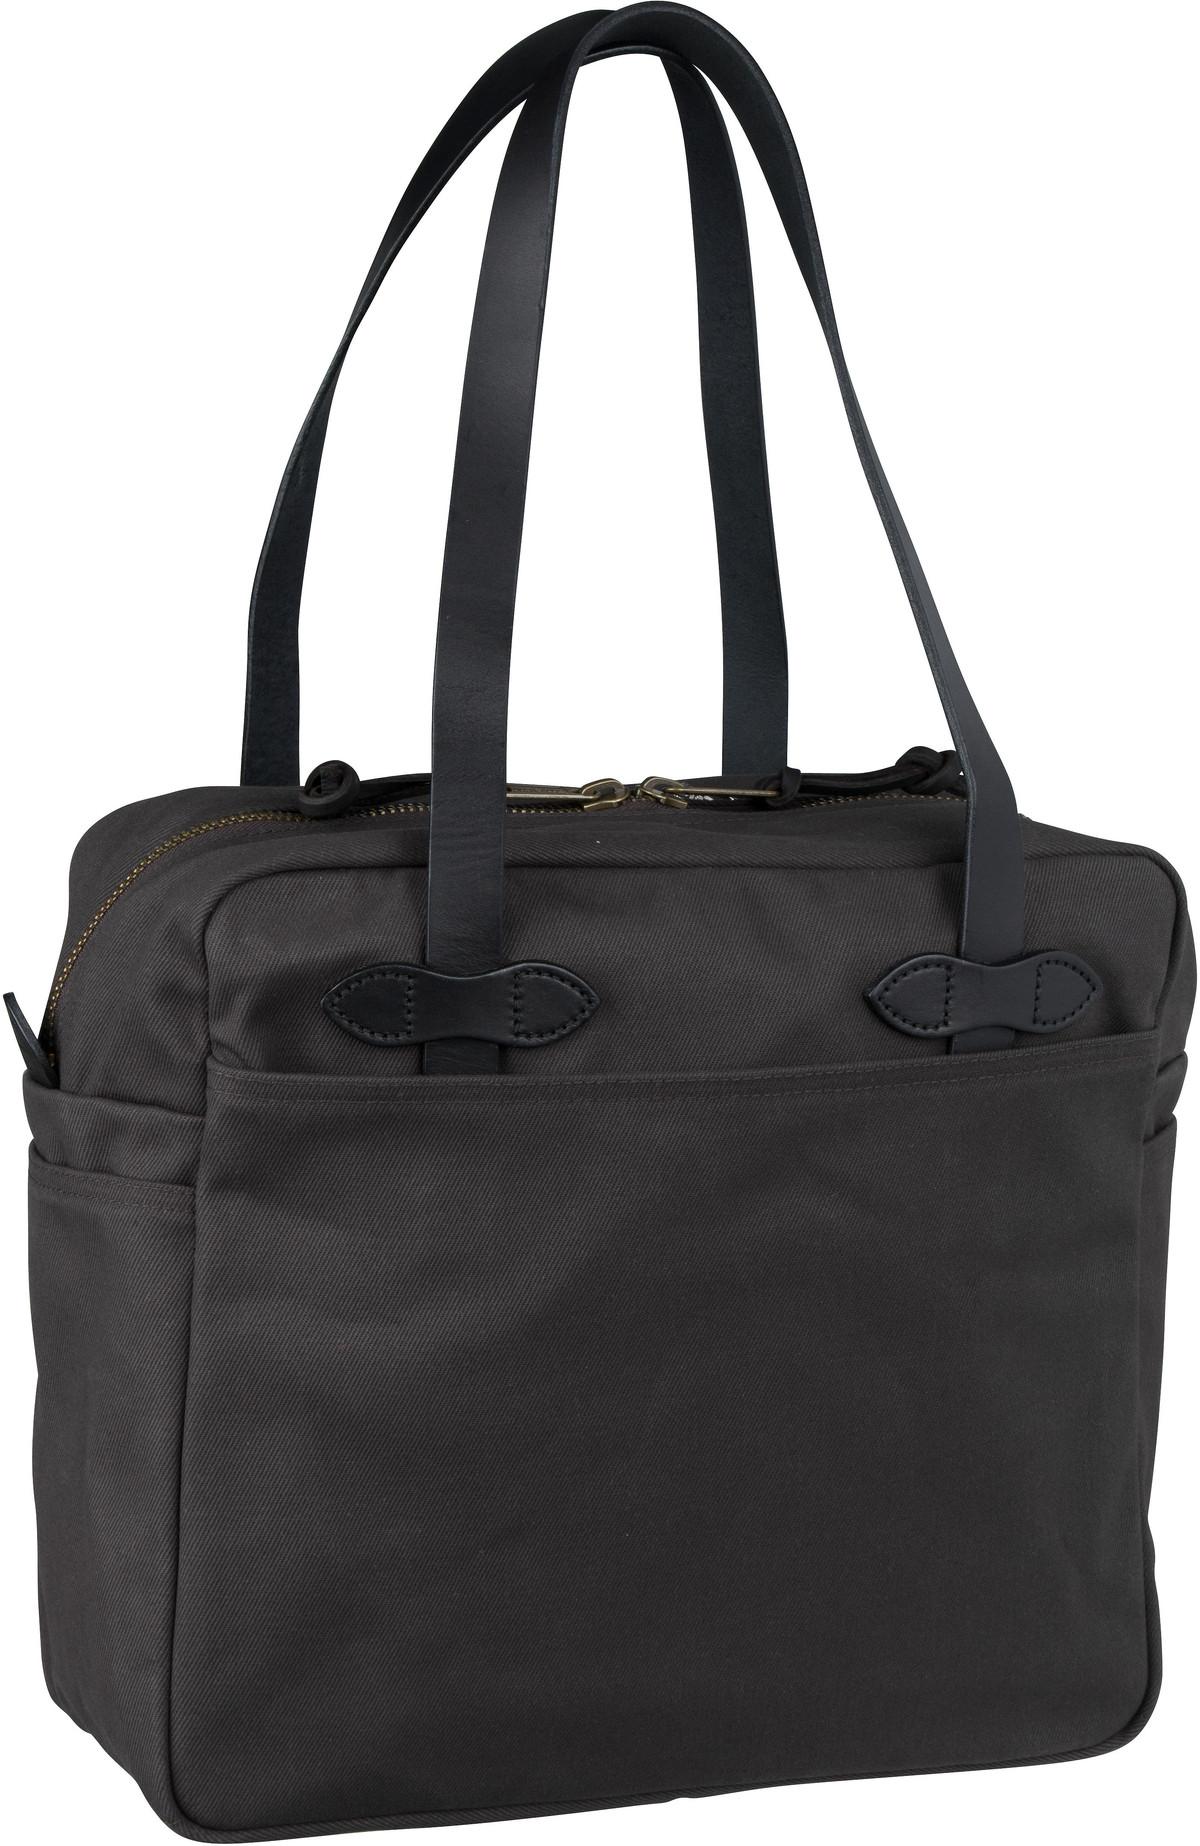 Filson Handtasche Tote Bag with Zipper Cinder (25 Liter)